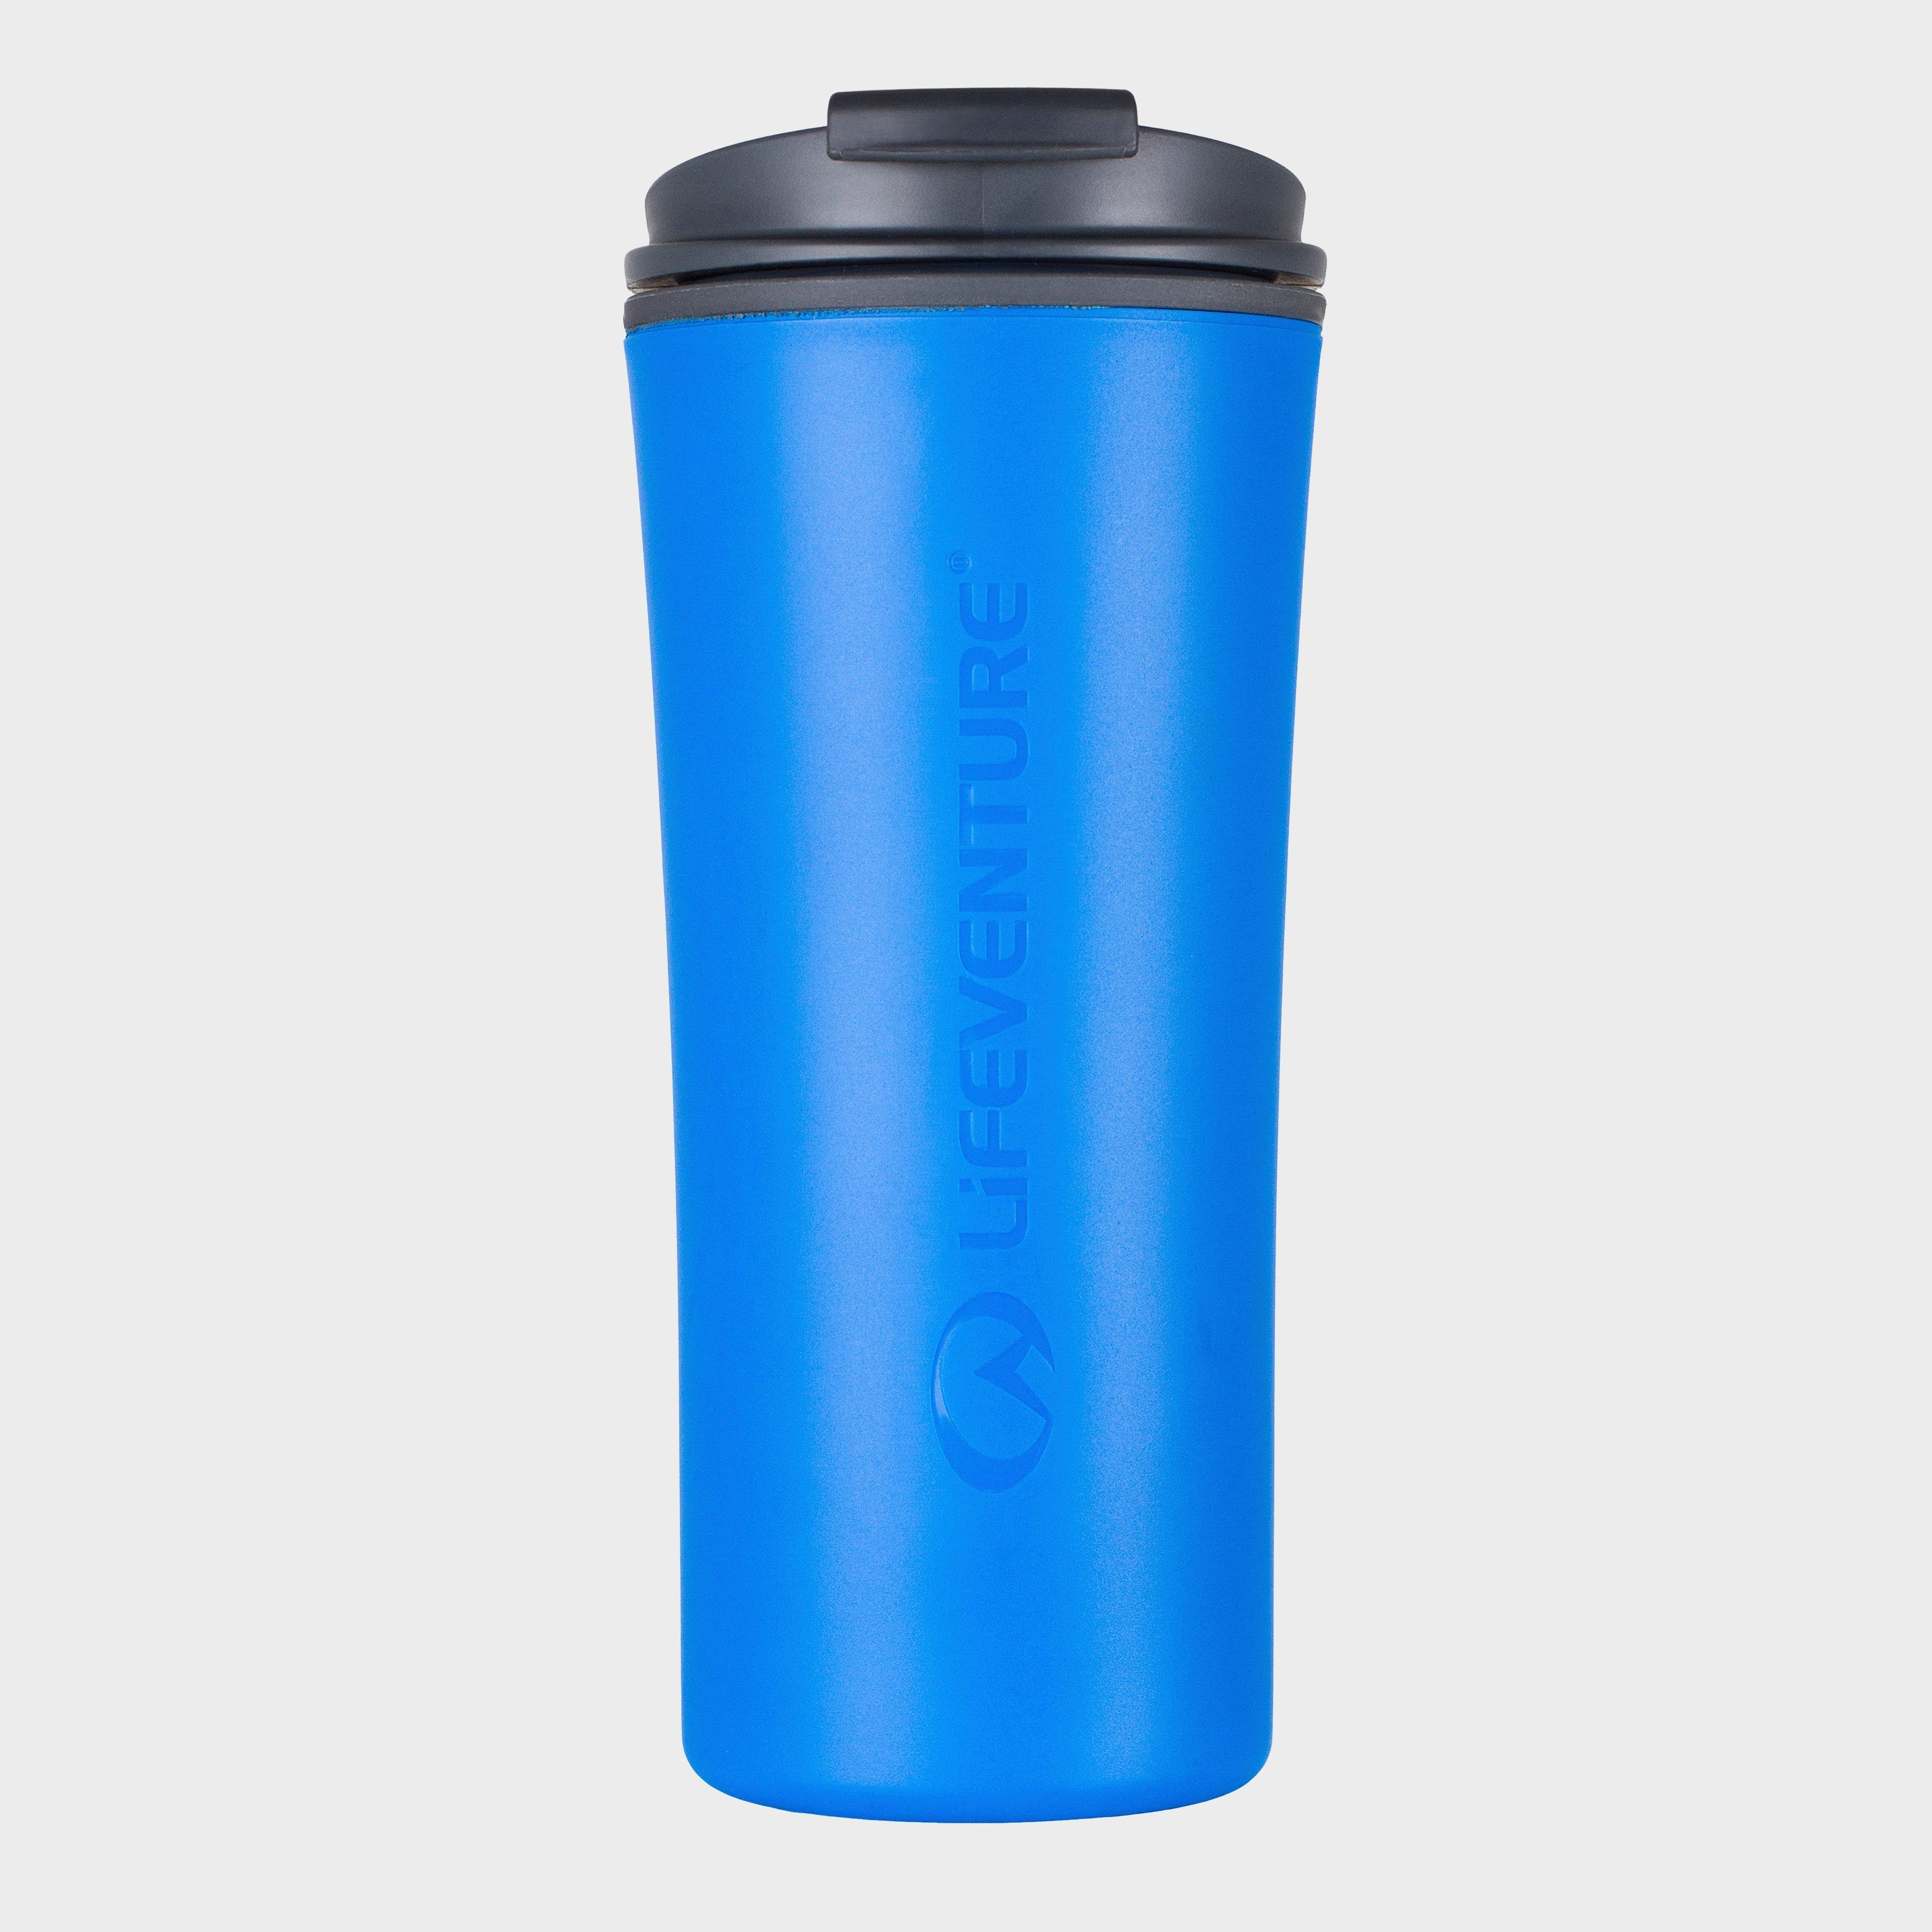 Lifeventure Lifeventure Elipse Travel Mug - Blue, Blue